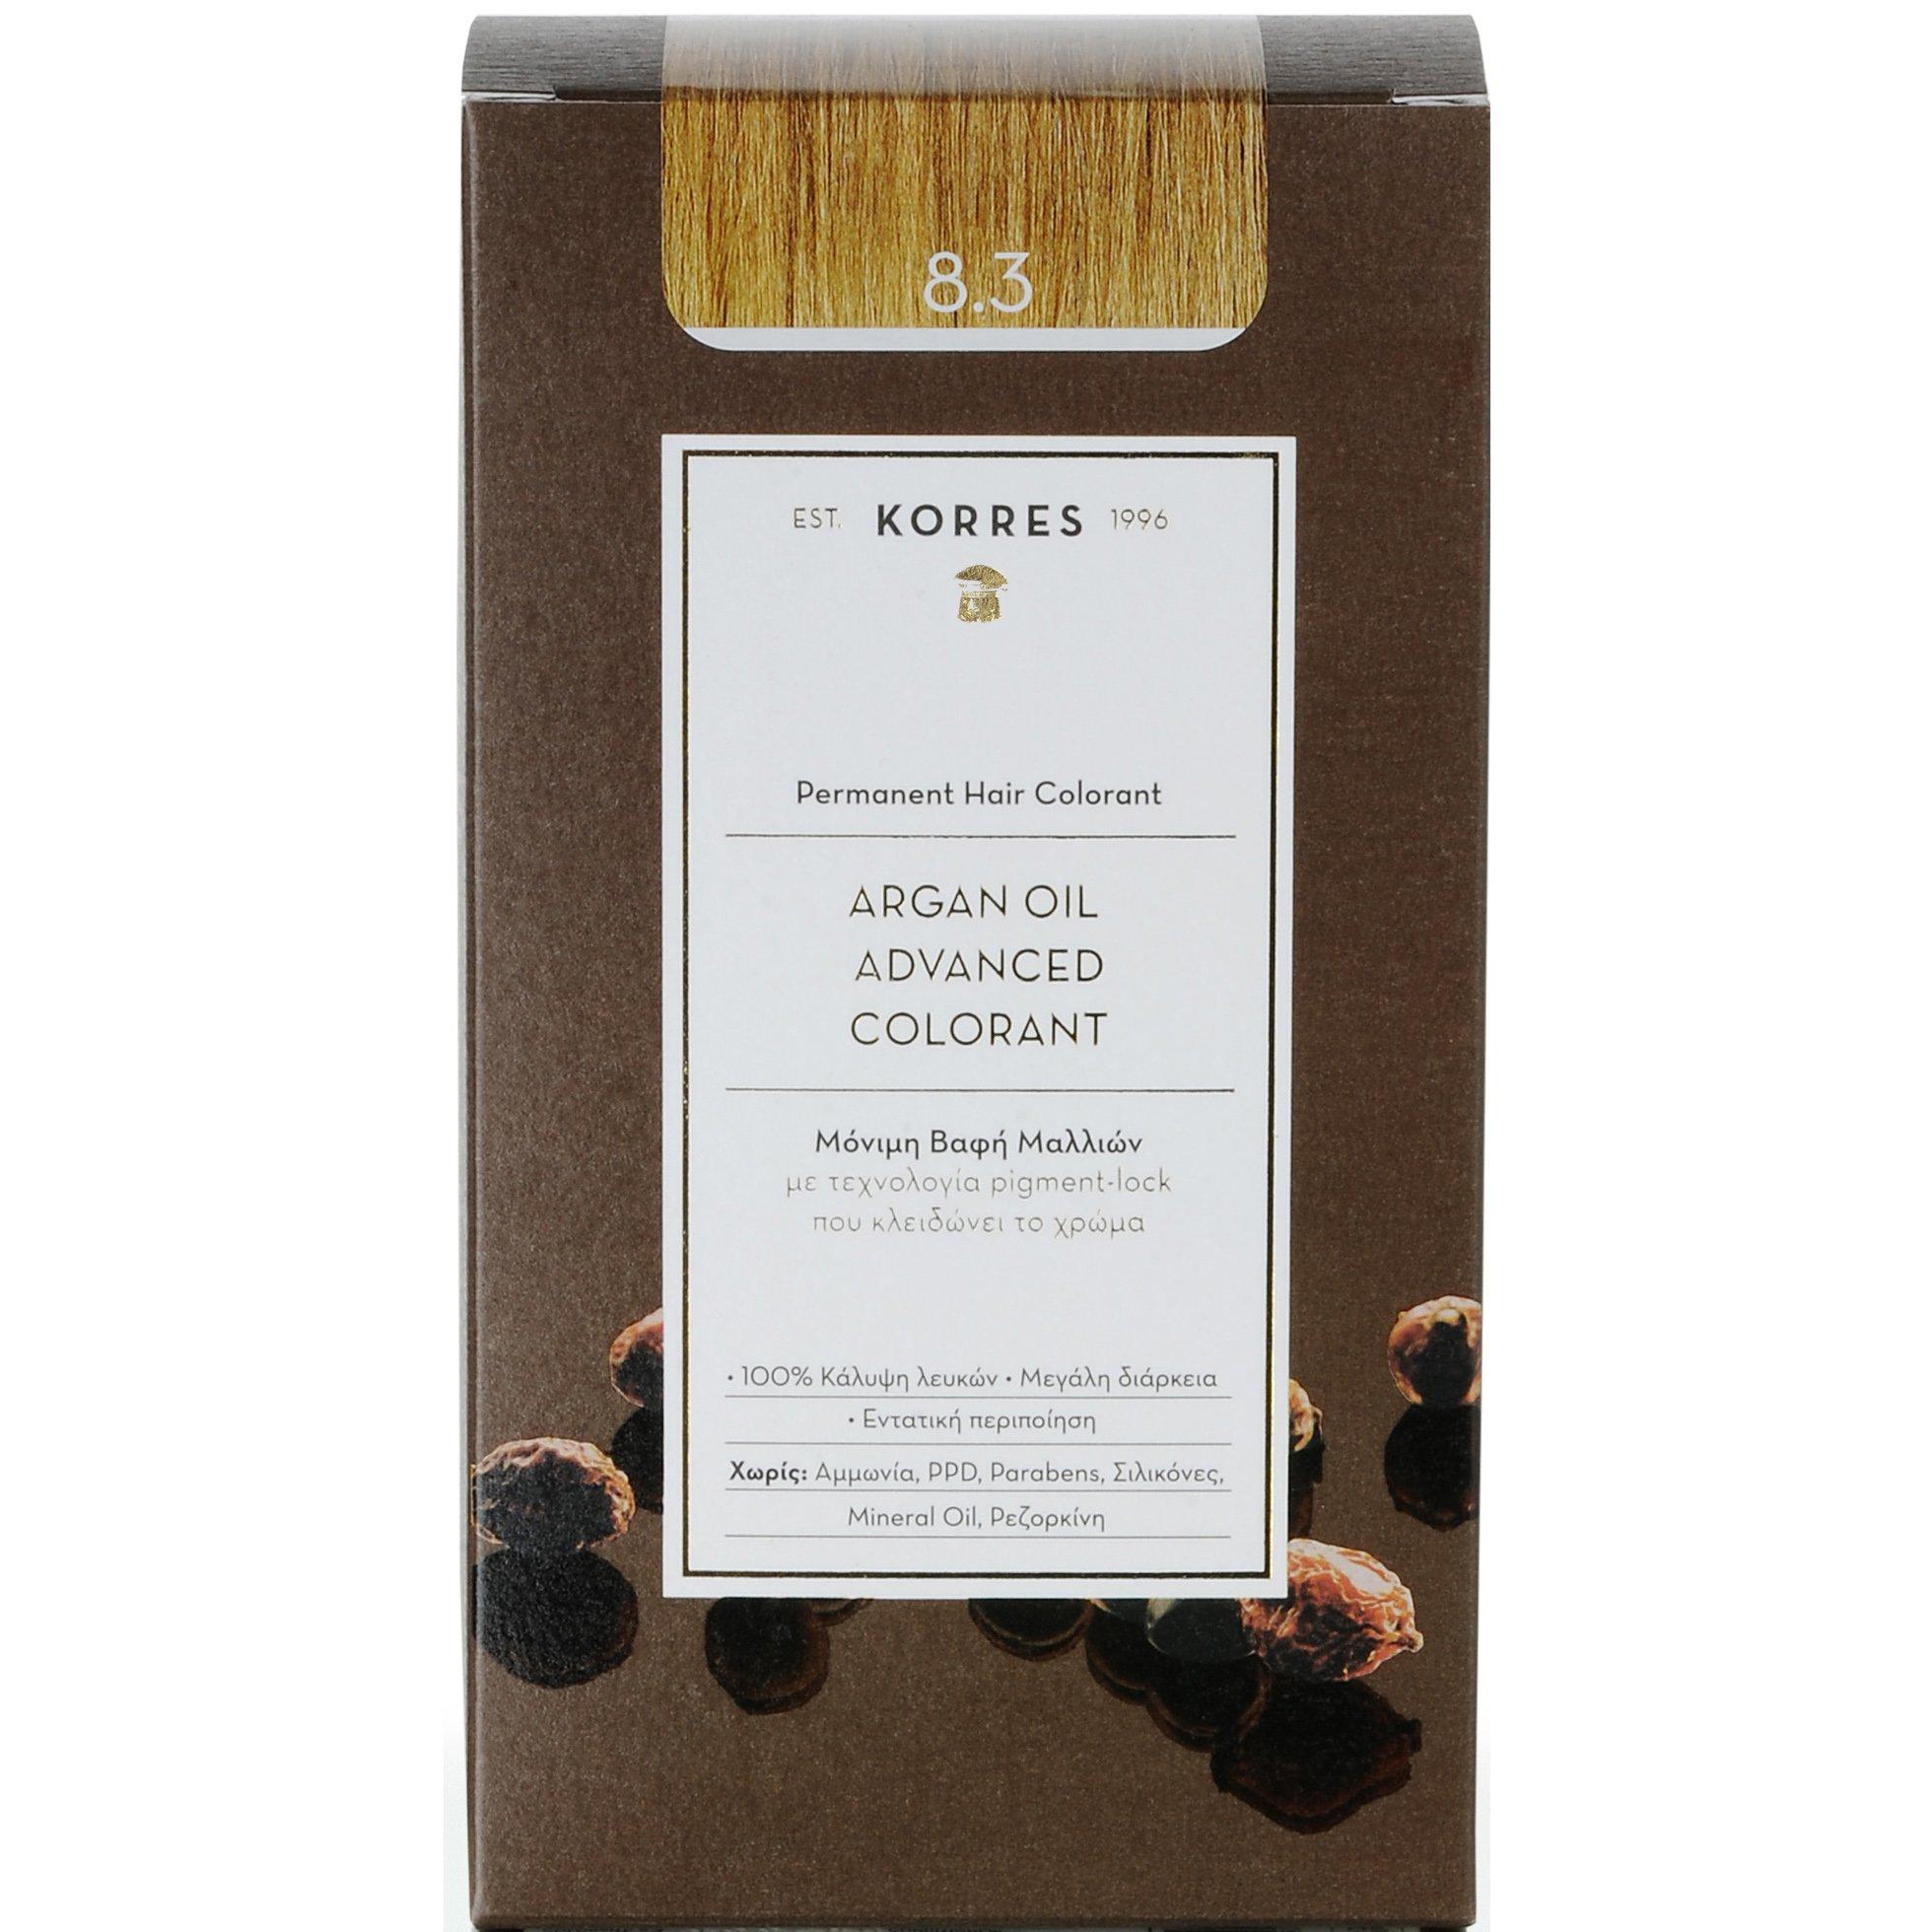 Korres Argan Oil Advanced Colorant Μόνιμη Βαφή Μαλλιών με Τεχνολογία Pigment-Lock που Κλειδώνει το Χρώμα 50ml – 8.3 ΞΑΝΘΟ ΑΝΟΙΧΤΟ ΜΕΛΙ